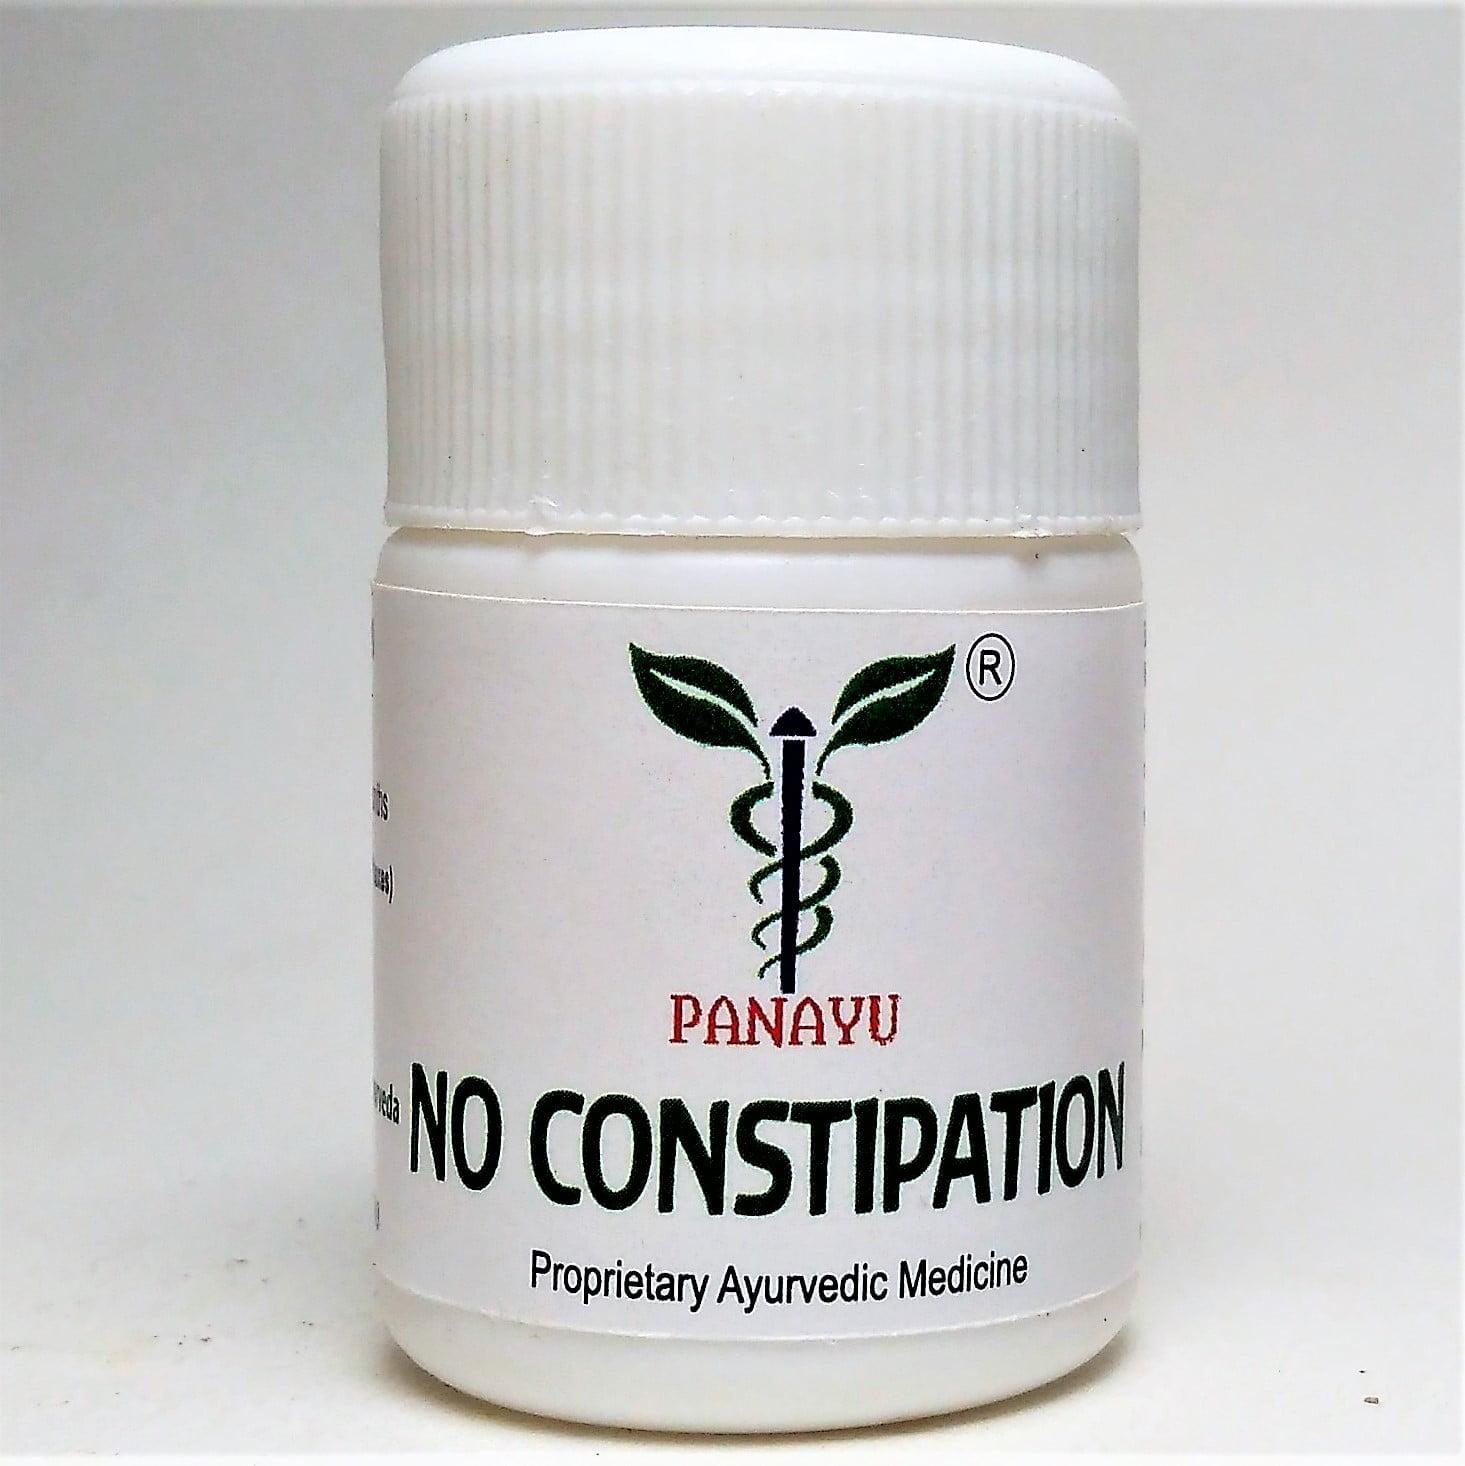 Panayu No Constipation 1